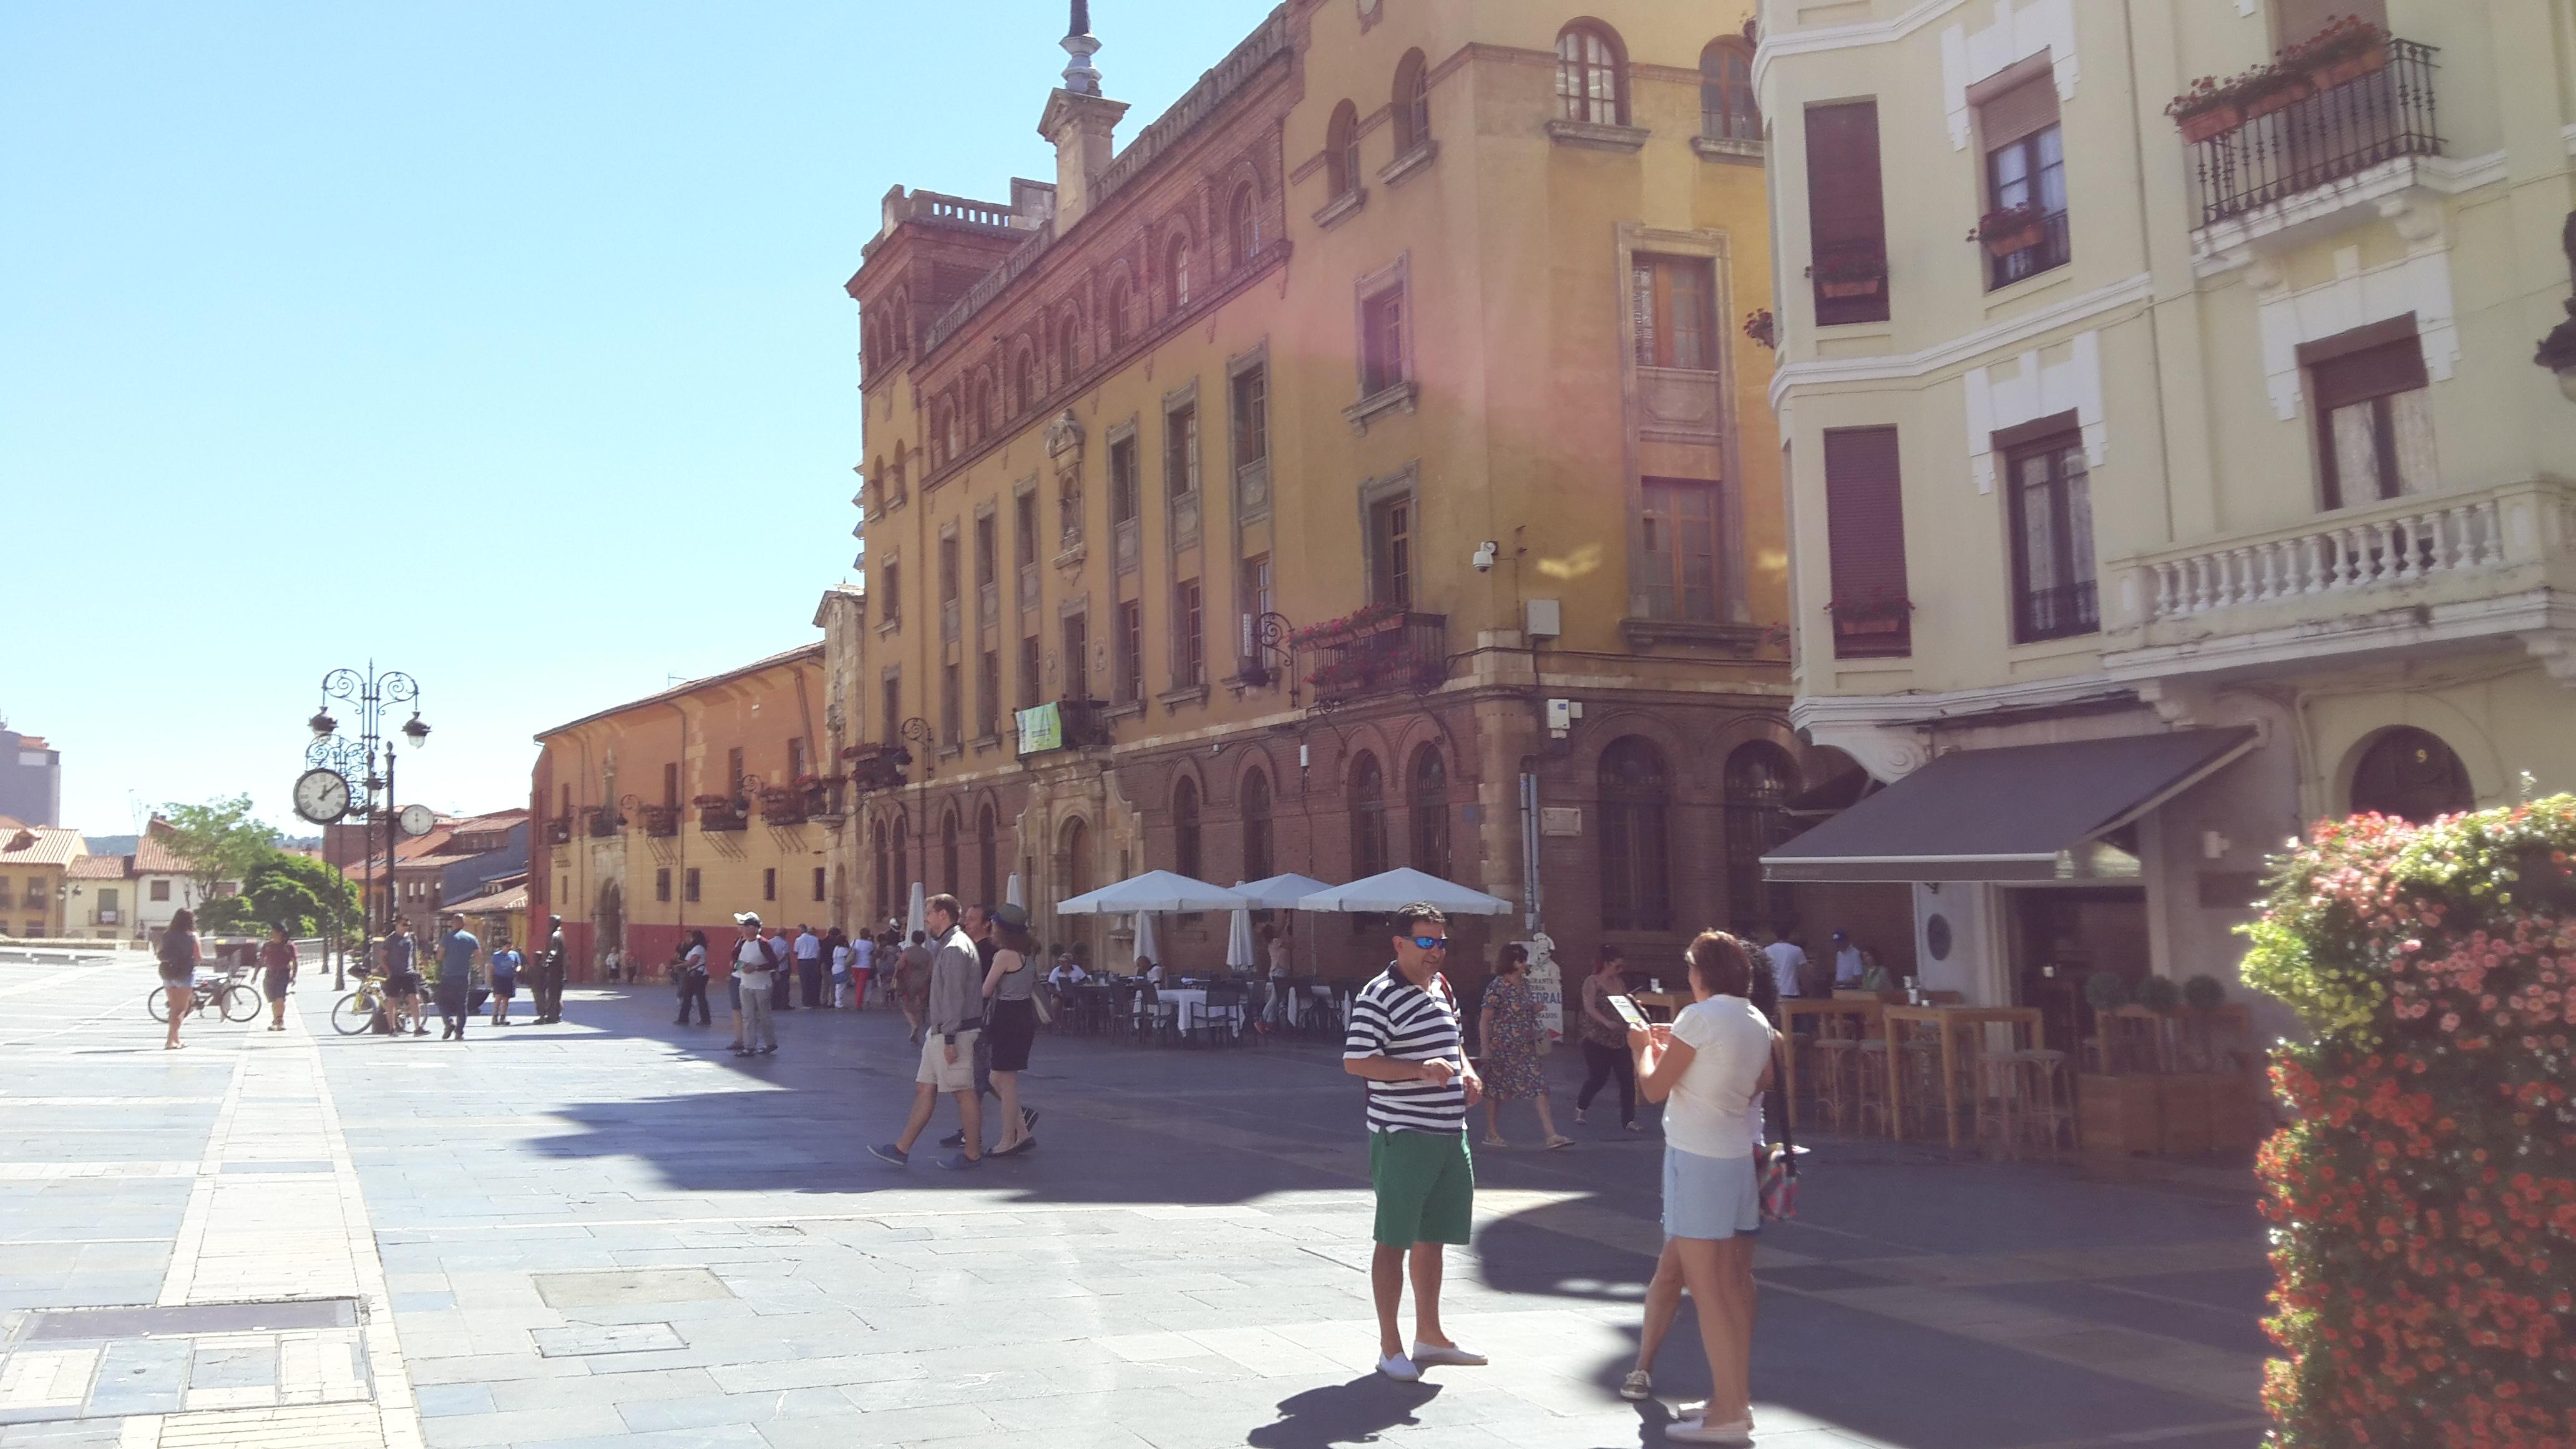 León Plaza de Regla